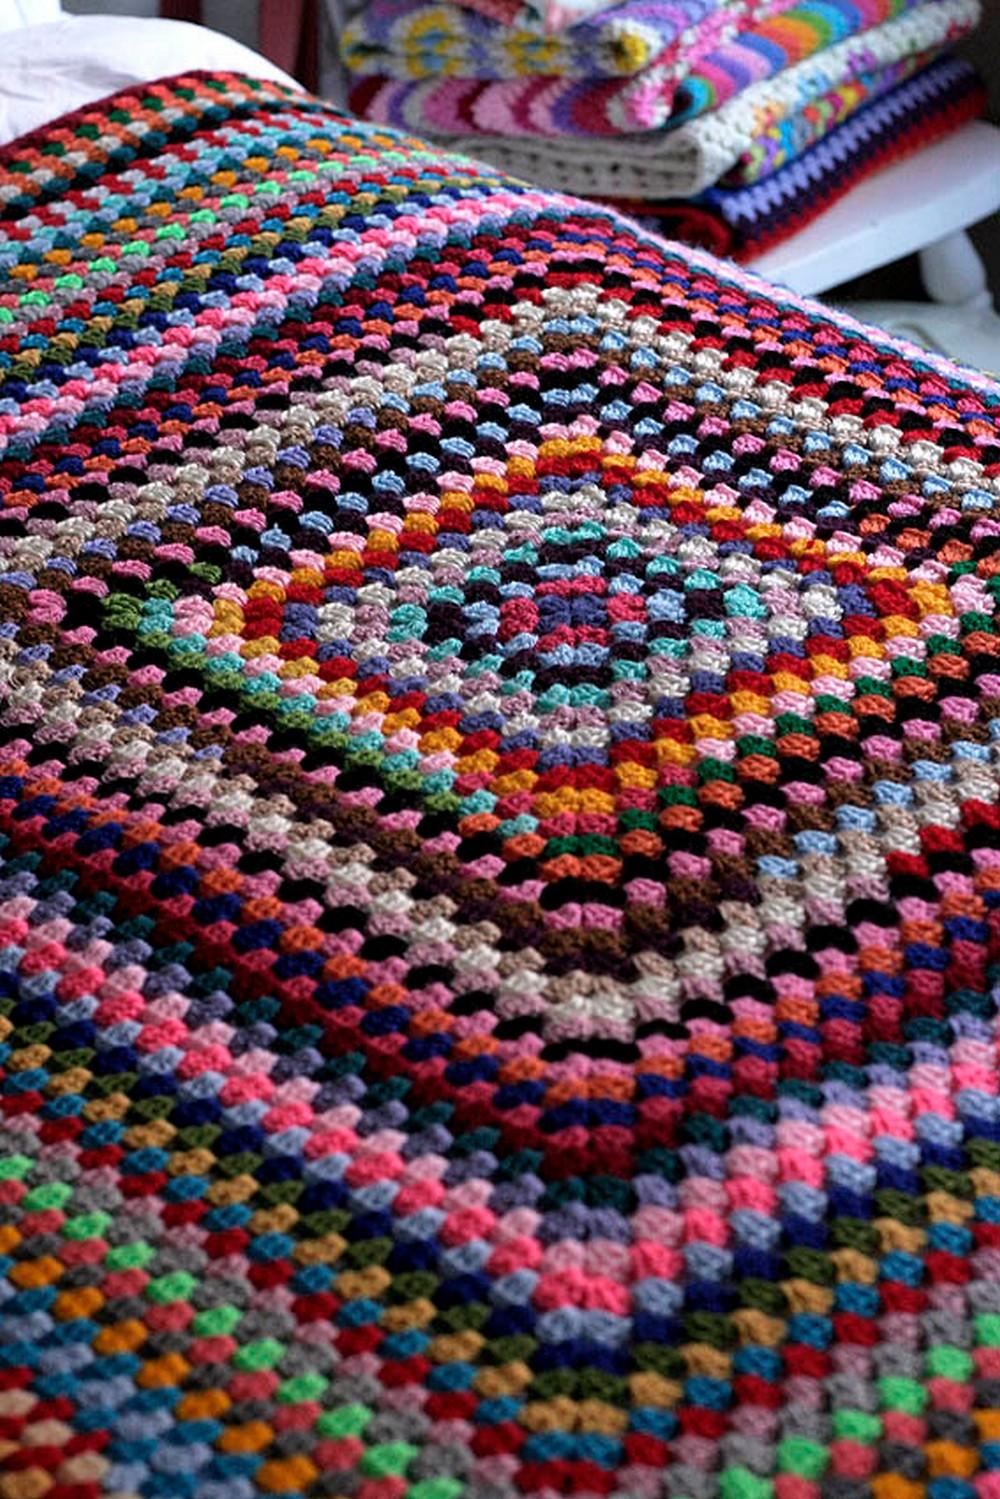 Giant Granny Square Crochet Blankets